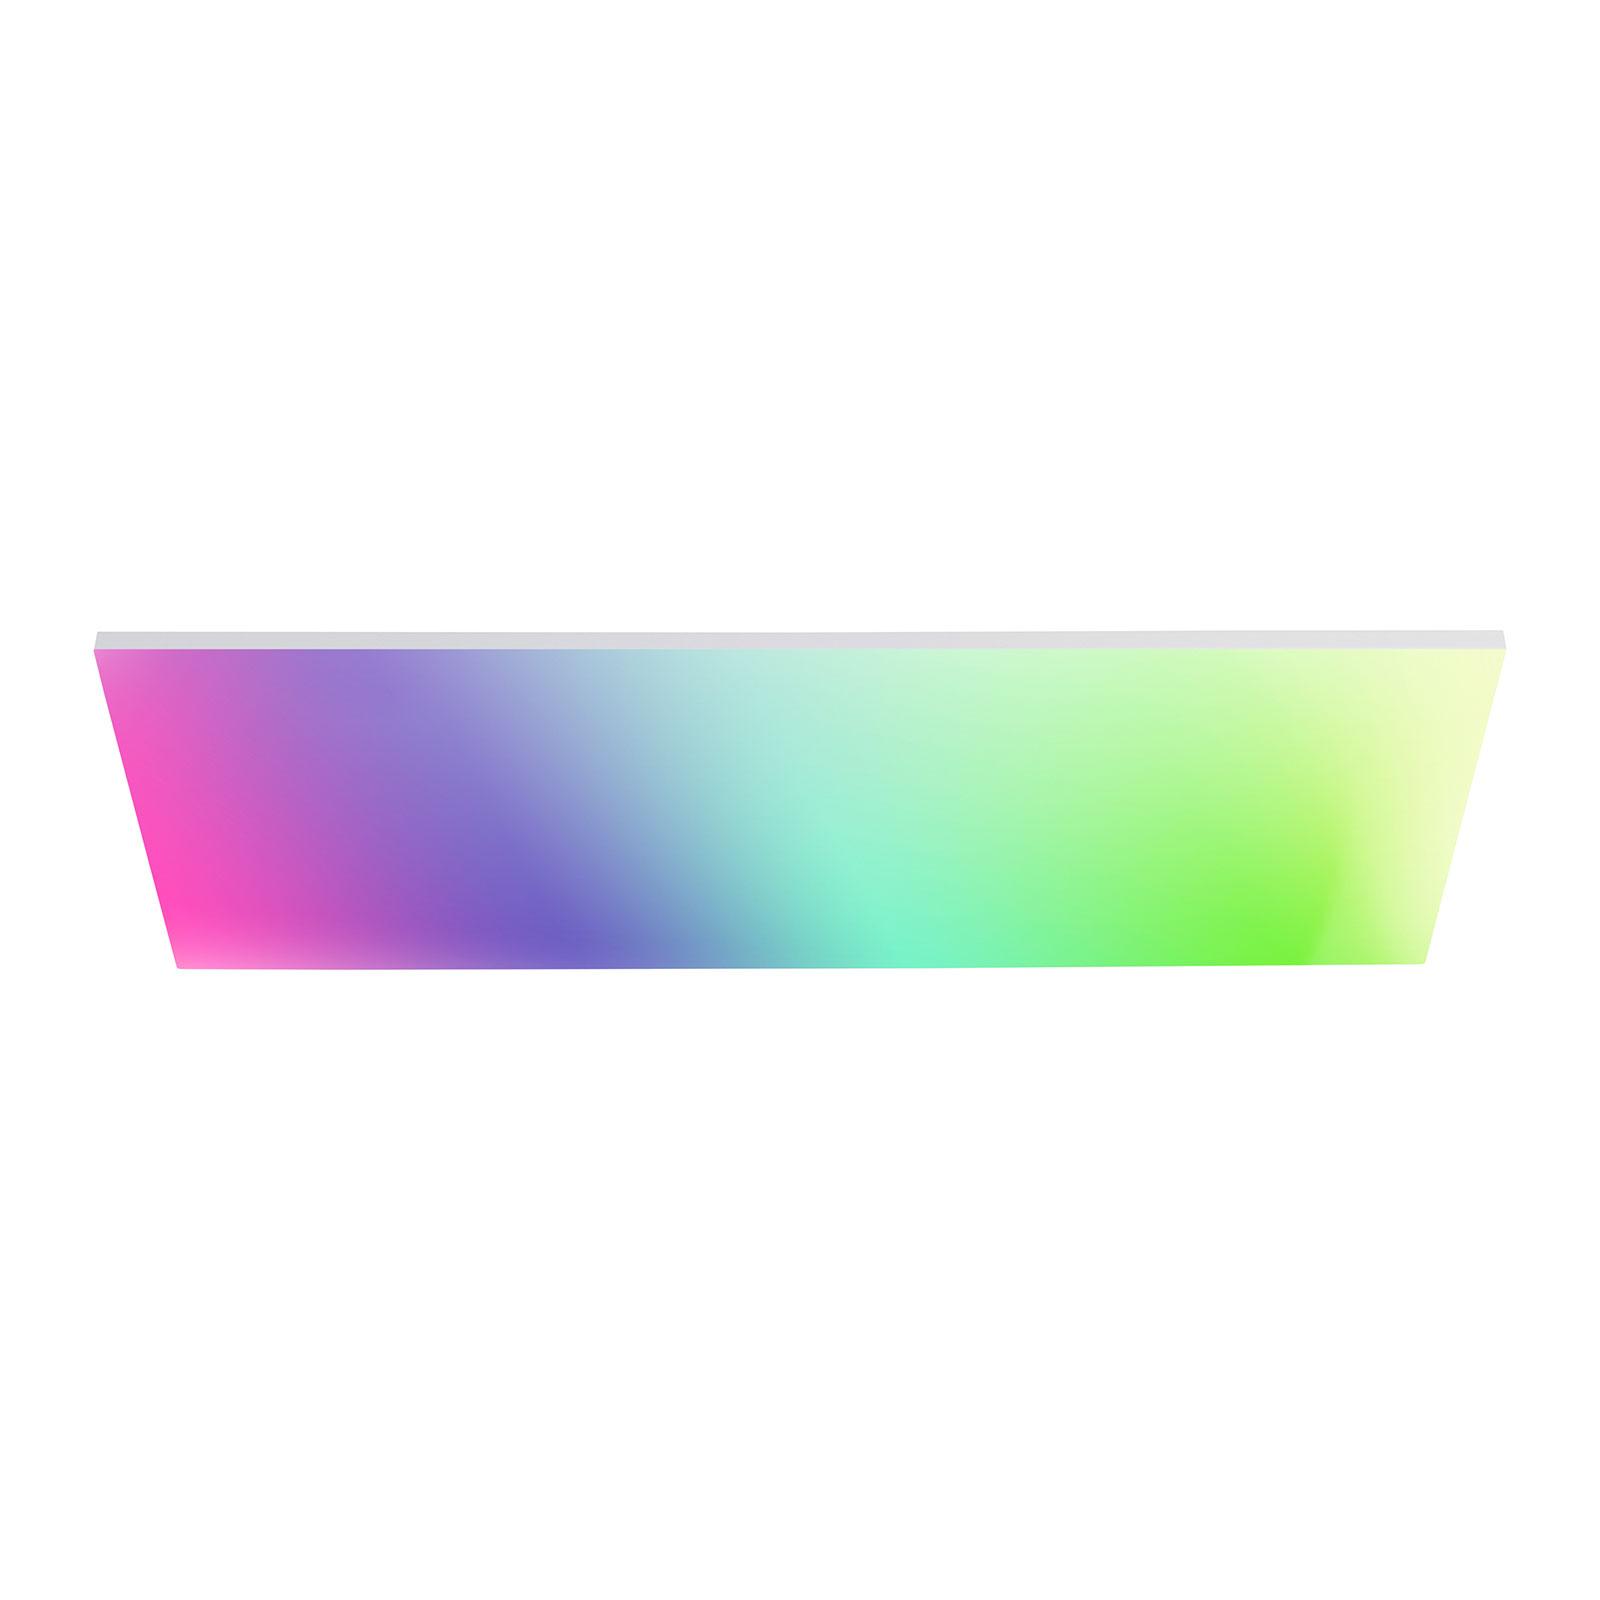 Müller Licht tint Aris LED-panel 60 x 30 cm RGBW